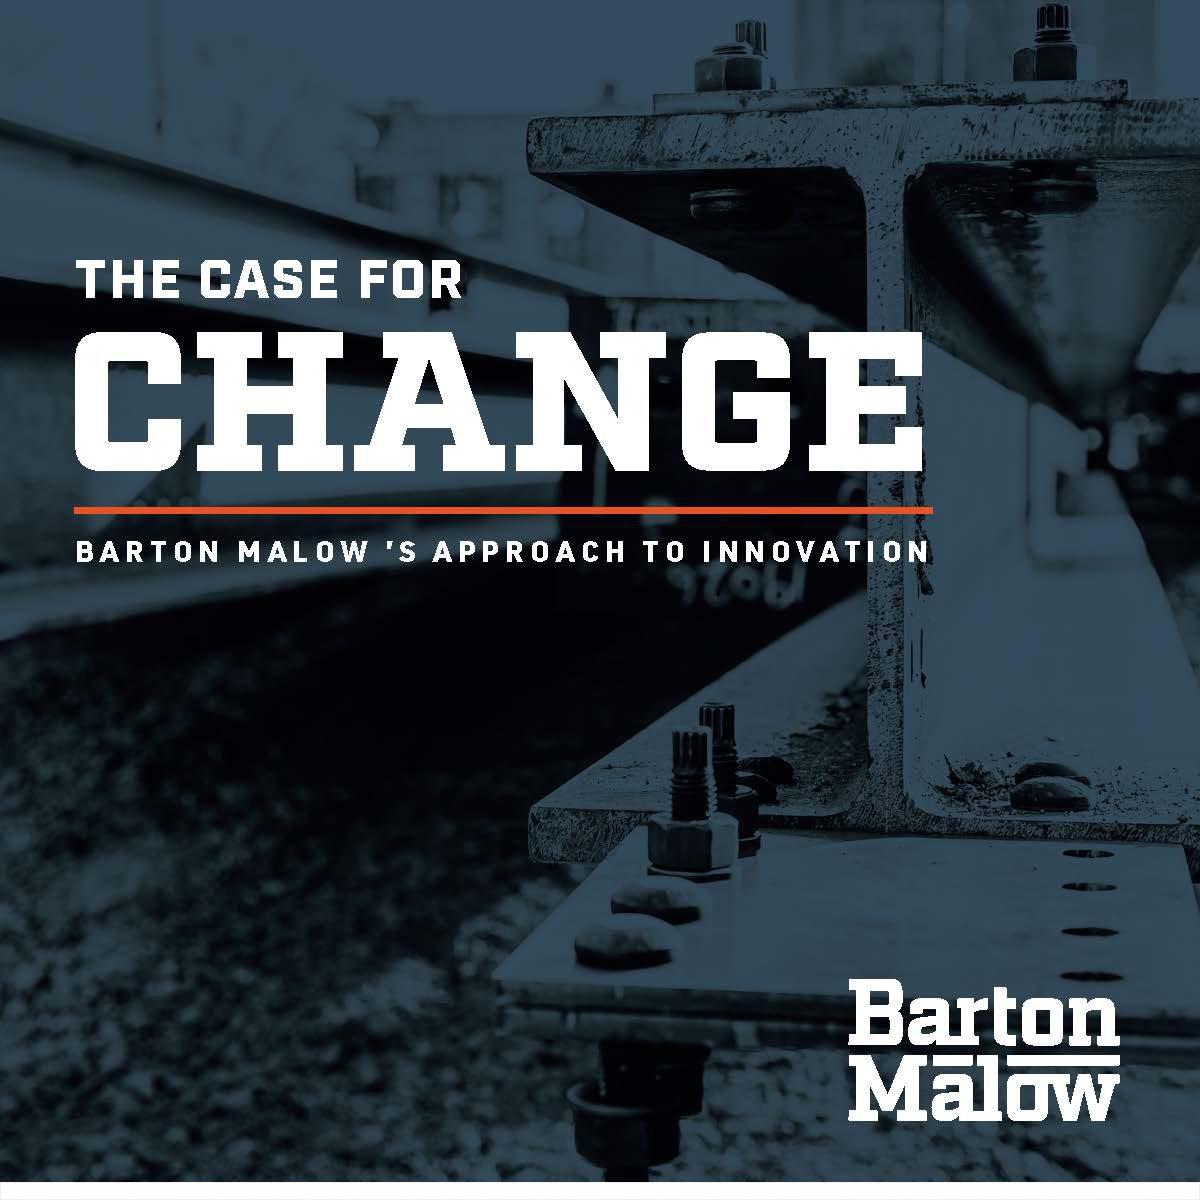 Barton Malow - Case for Change